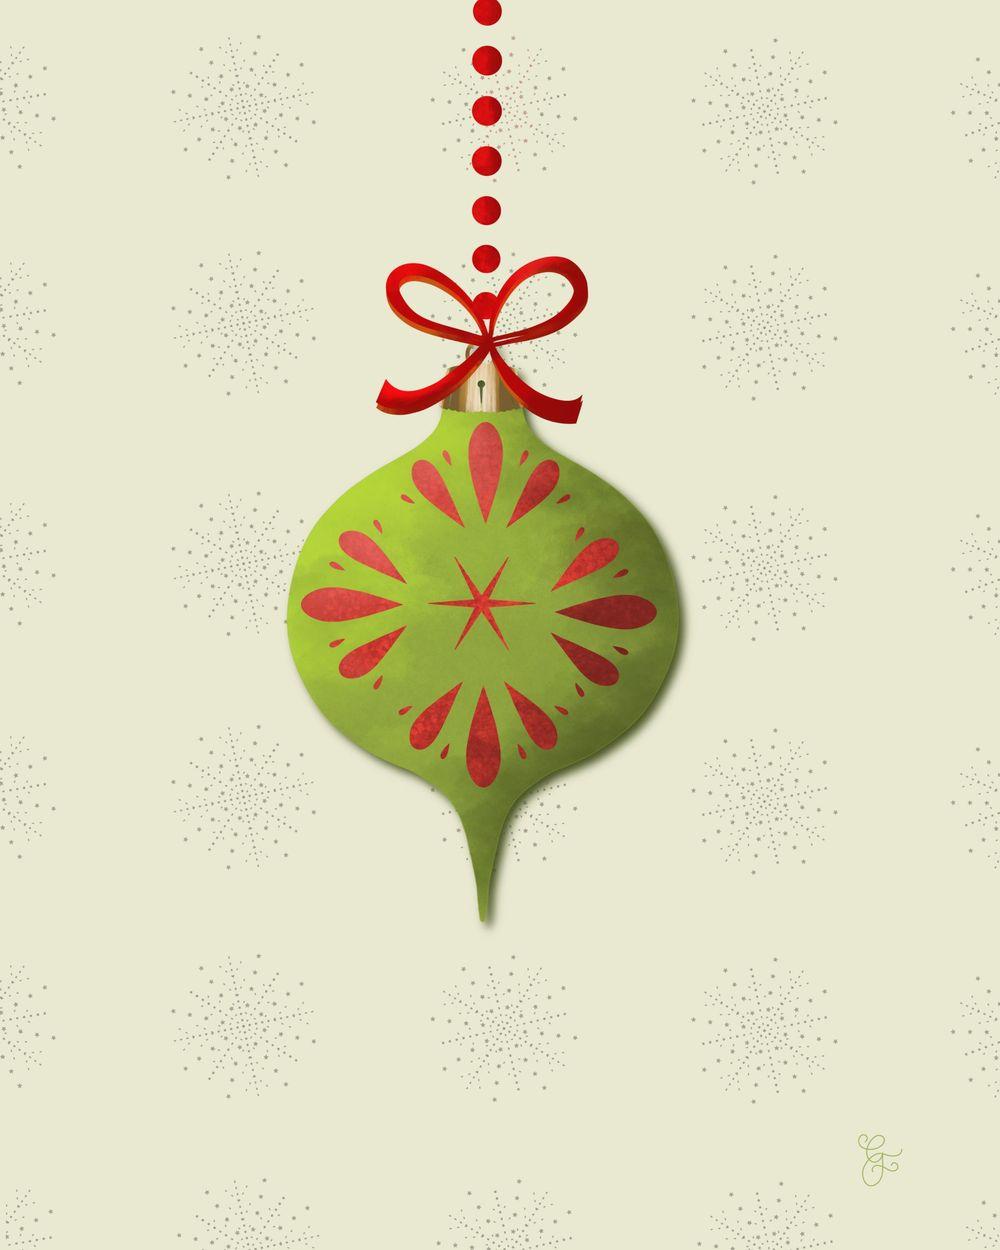 Ornaments went #ipadvintageornaments - image 6 - student project